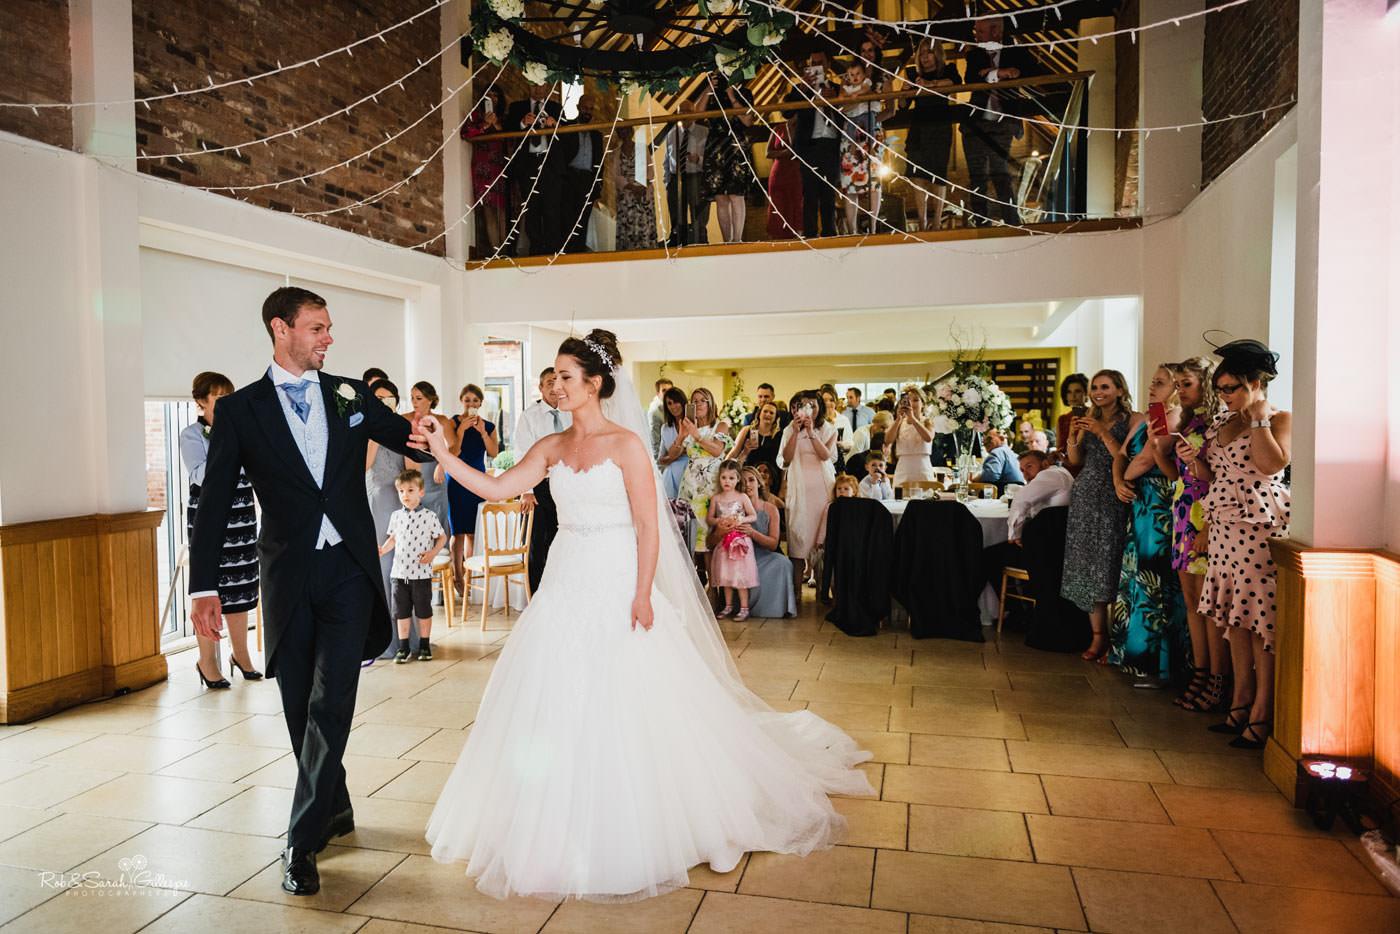 Evening reception at Delbury Hall wedding